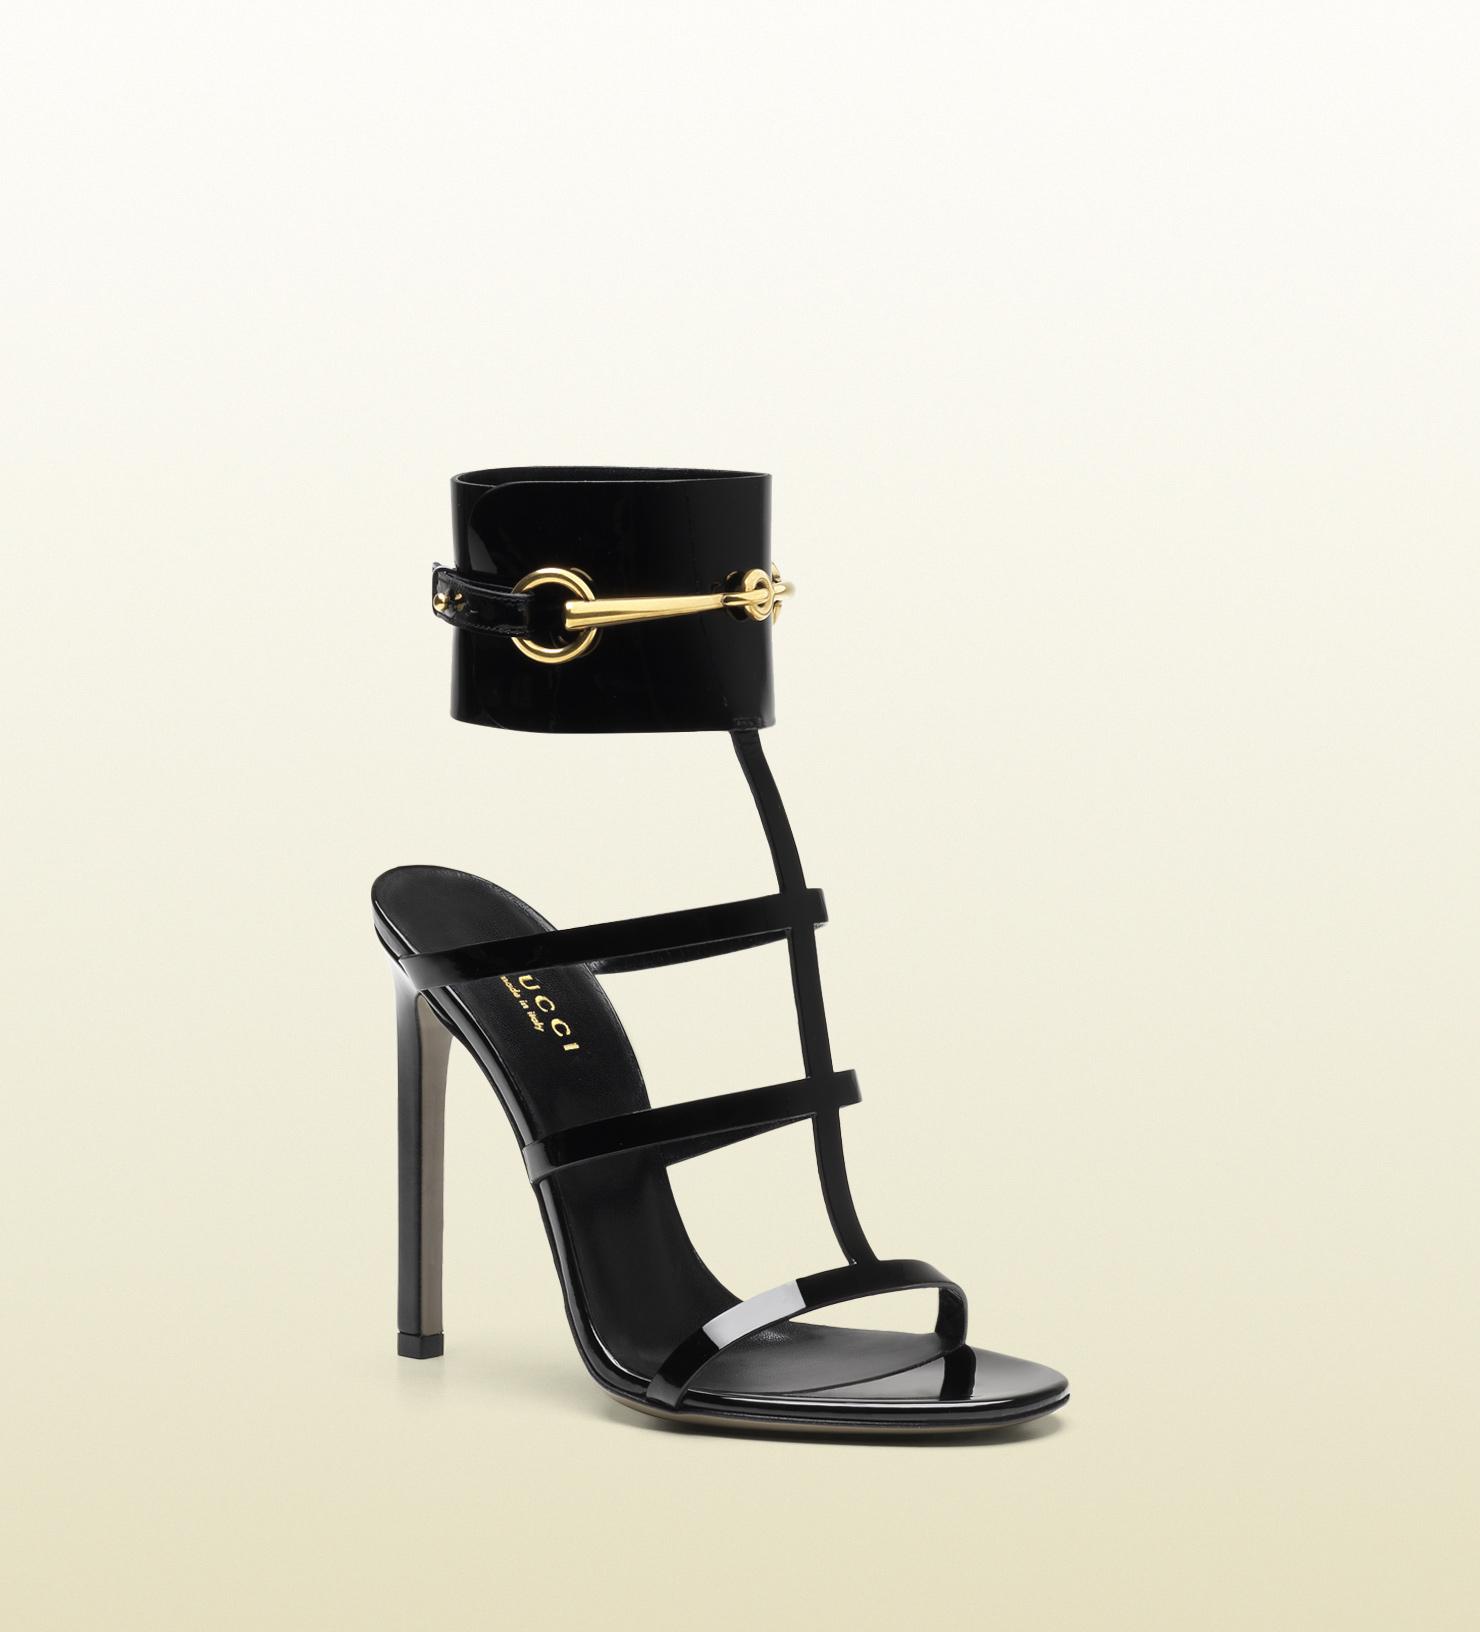 da24f3159810 Gucci - ankle-strap patent leather sandal 319588BNC001000